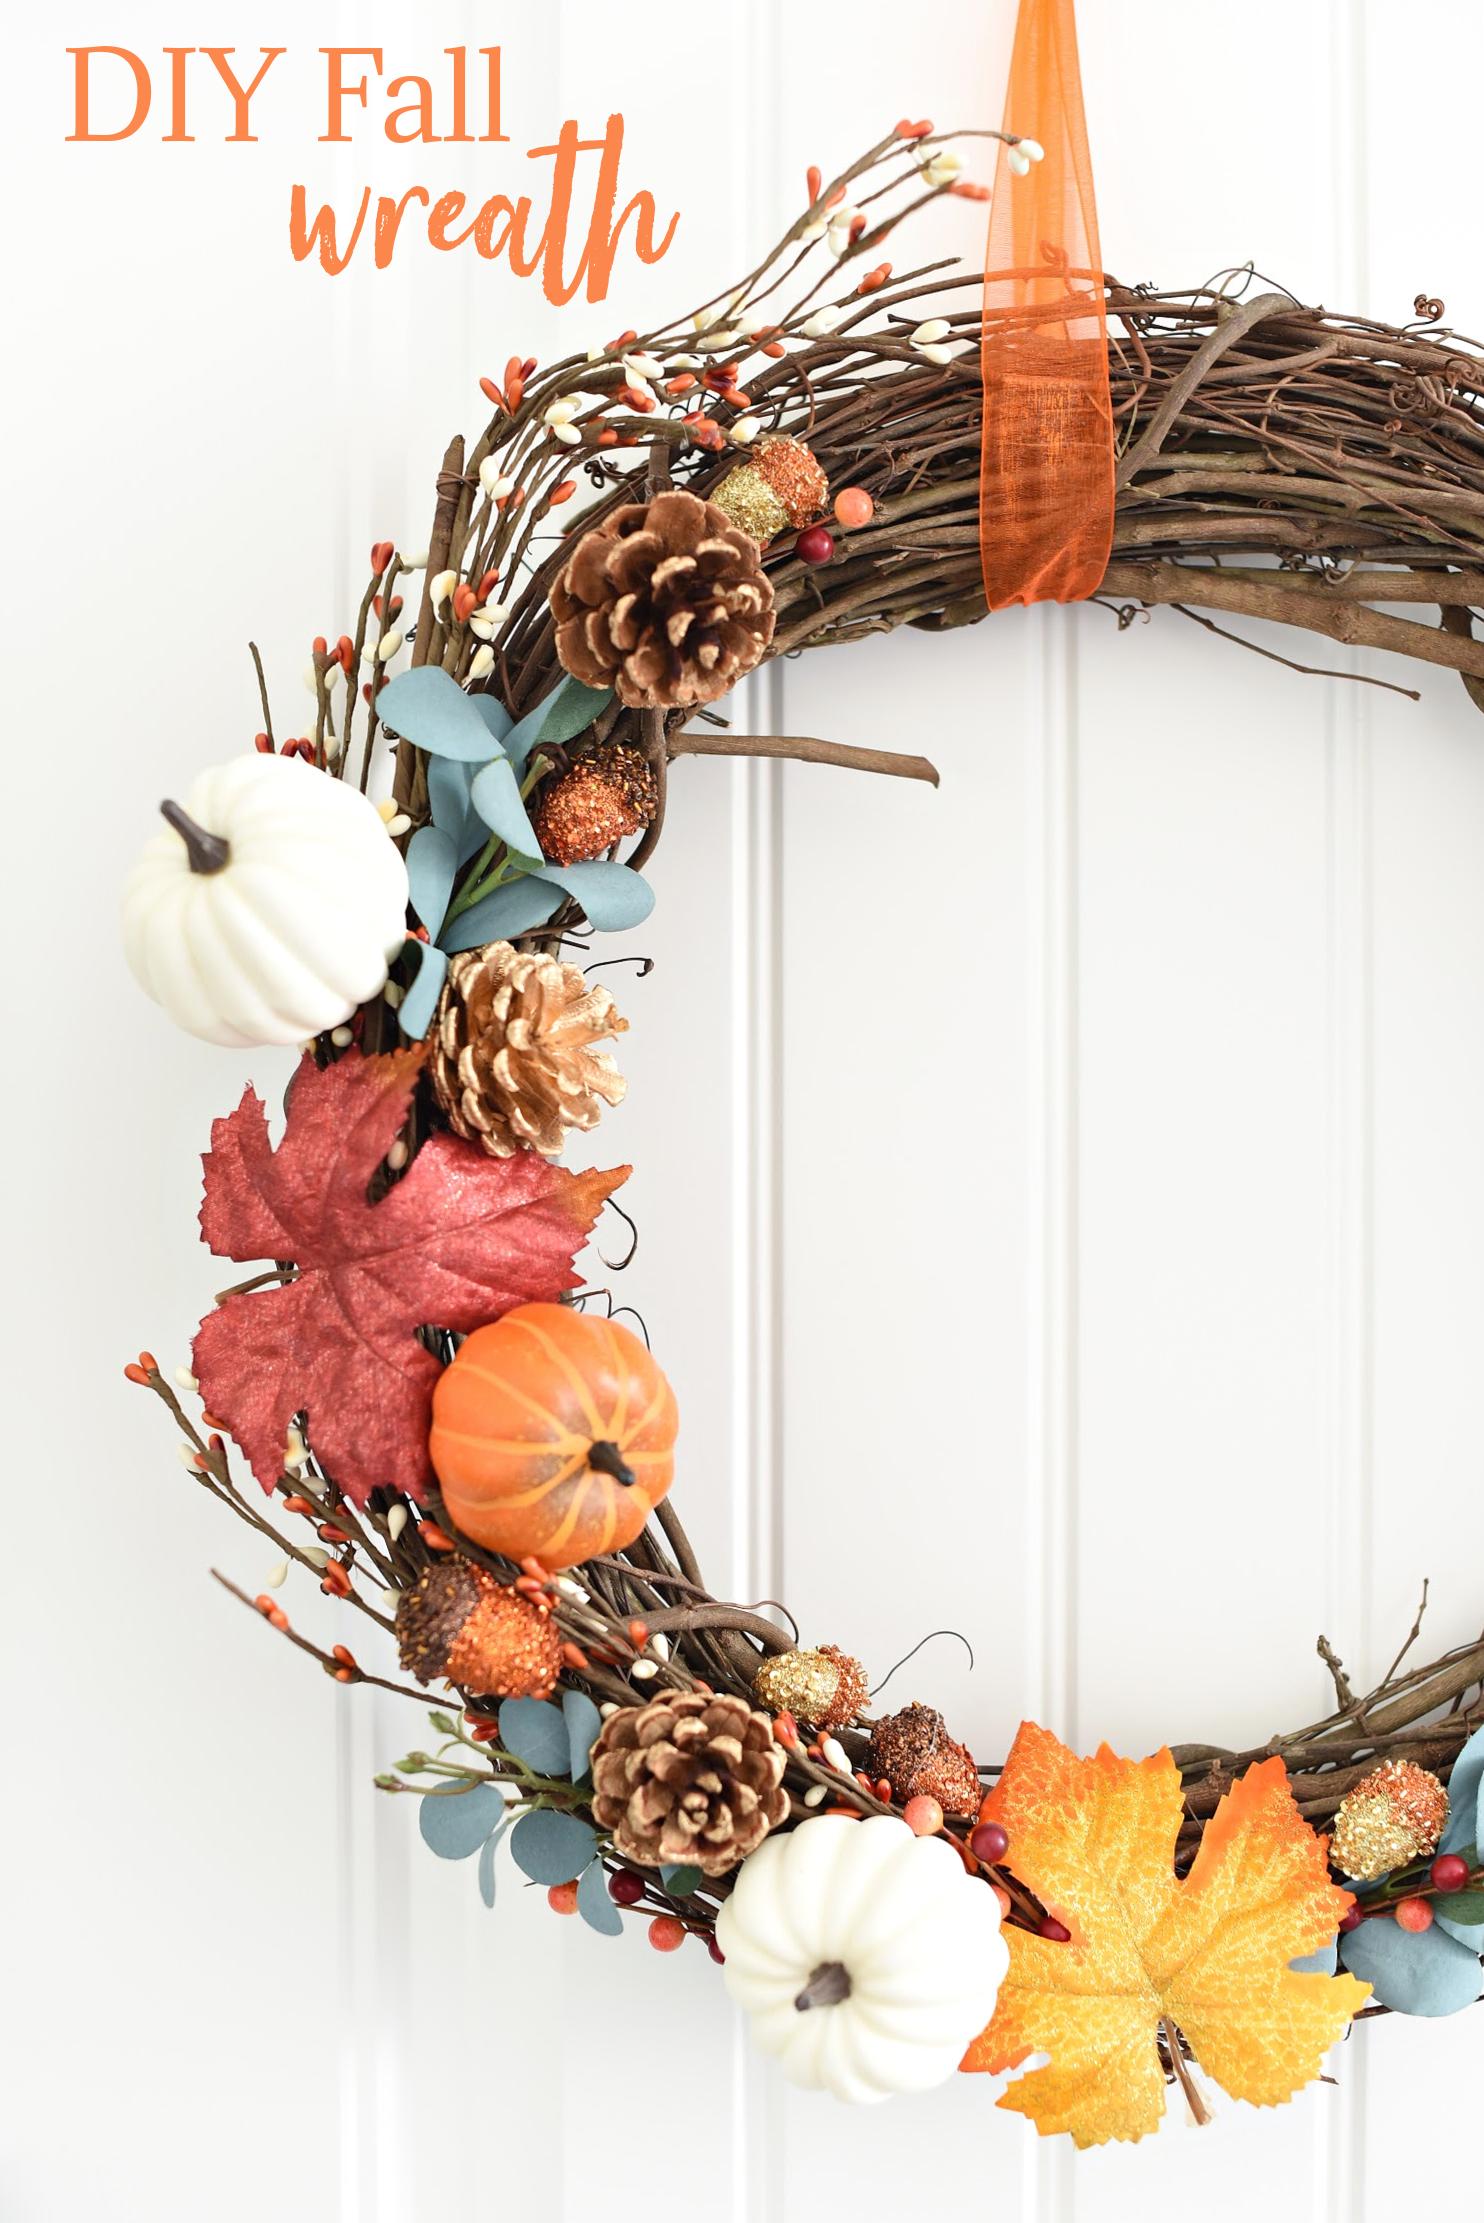 Easy DIY Fall Wreath to Hang on Your Front Door